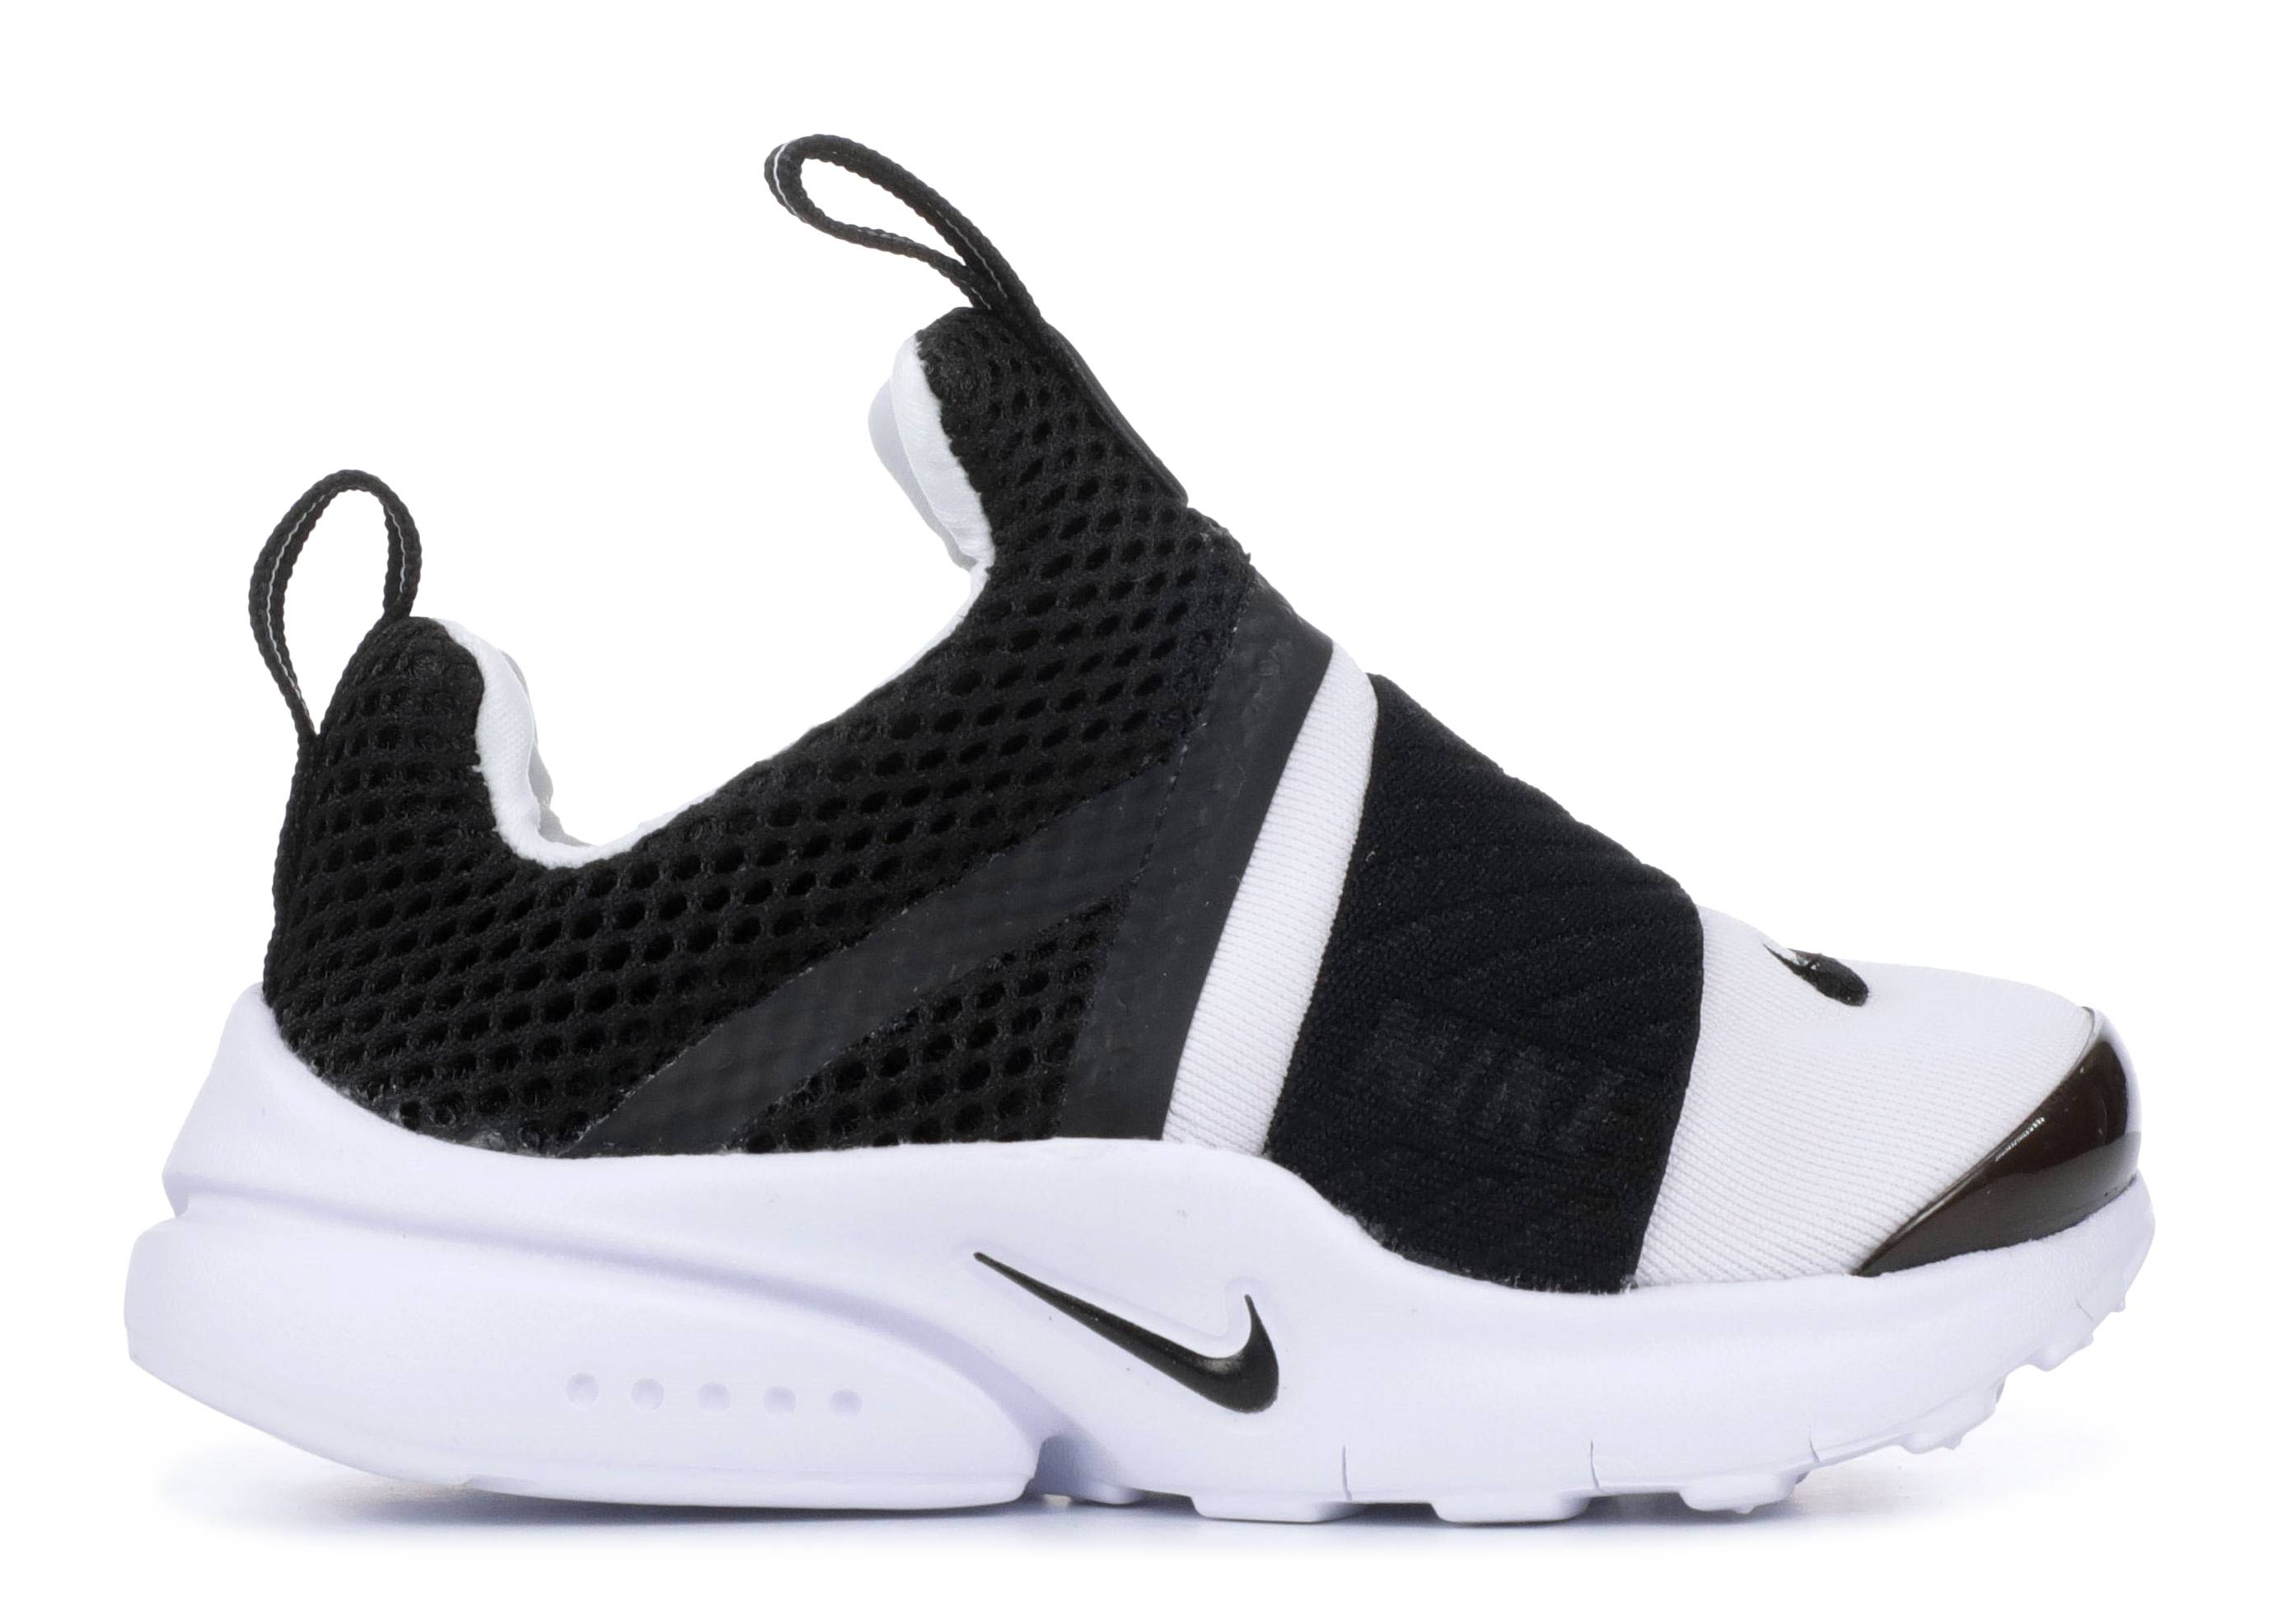 Nike Presto Extreme All Black Jordan Future Cool Grey High  349086af0